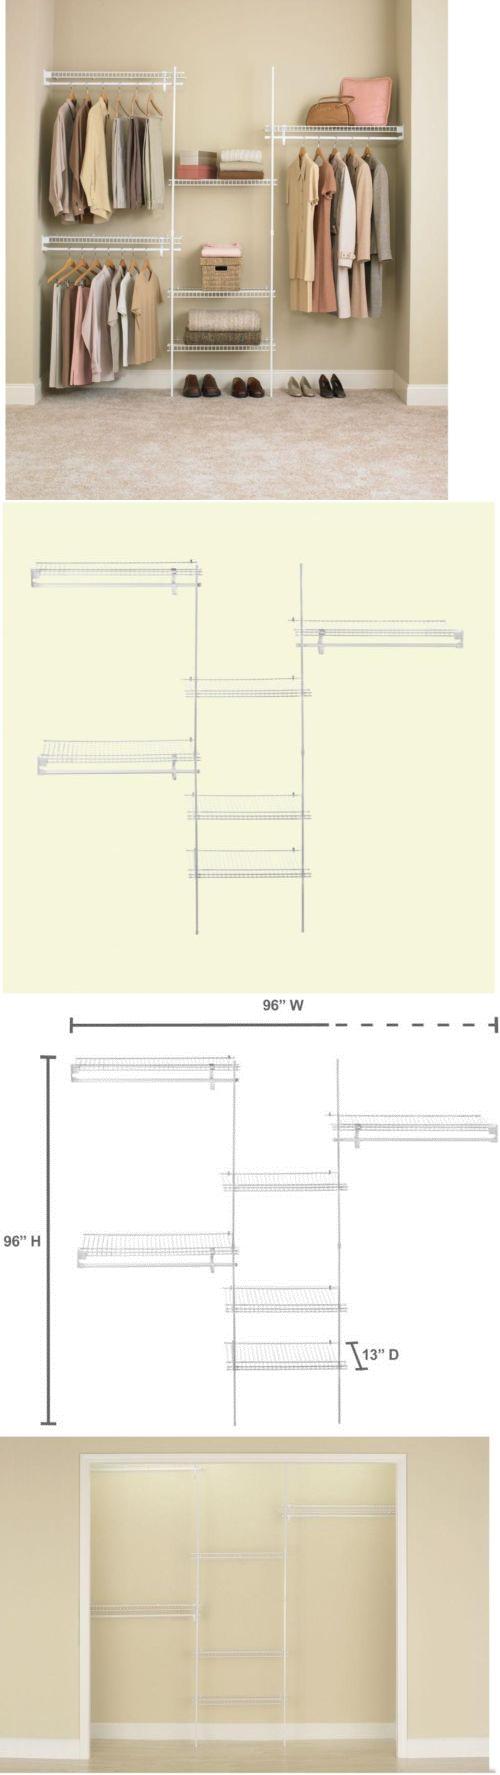 Closet Organizers 43503: Closetmaid Closet Organizer Kit White Ventilated  Wire Shelves (5 Ft.